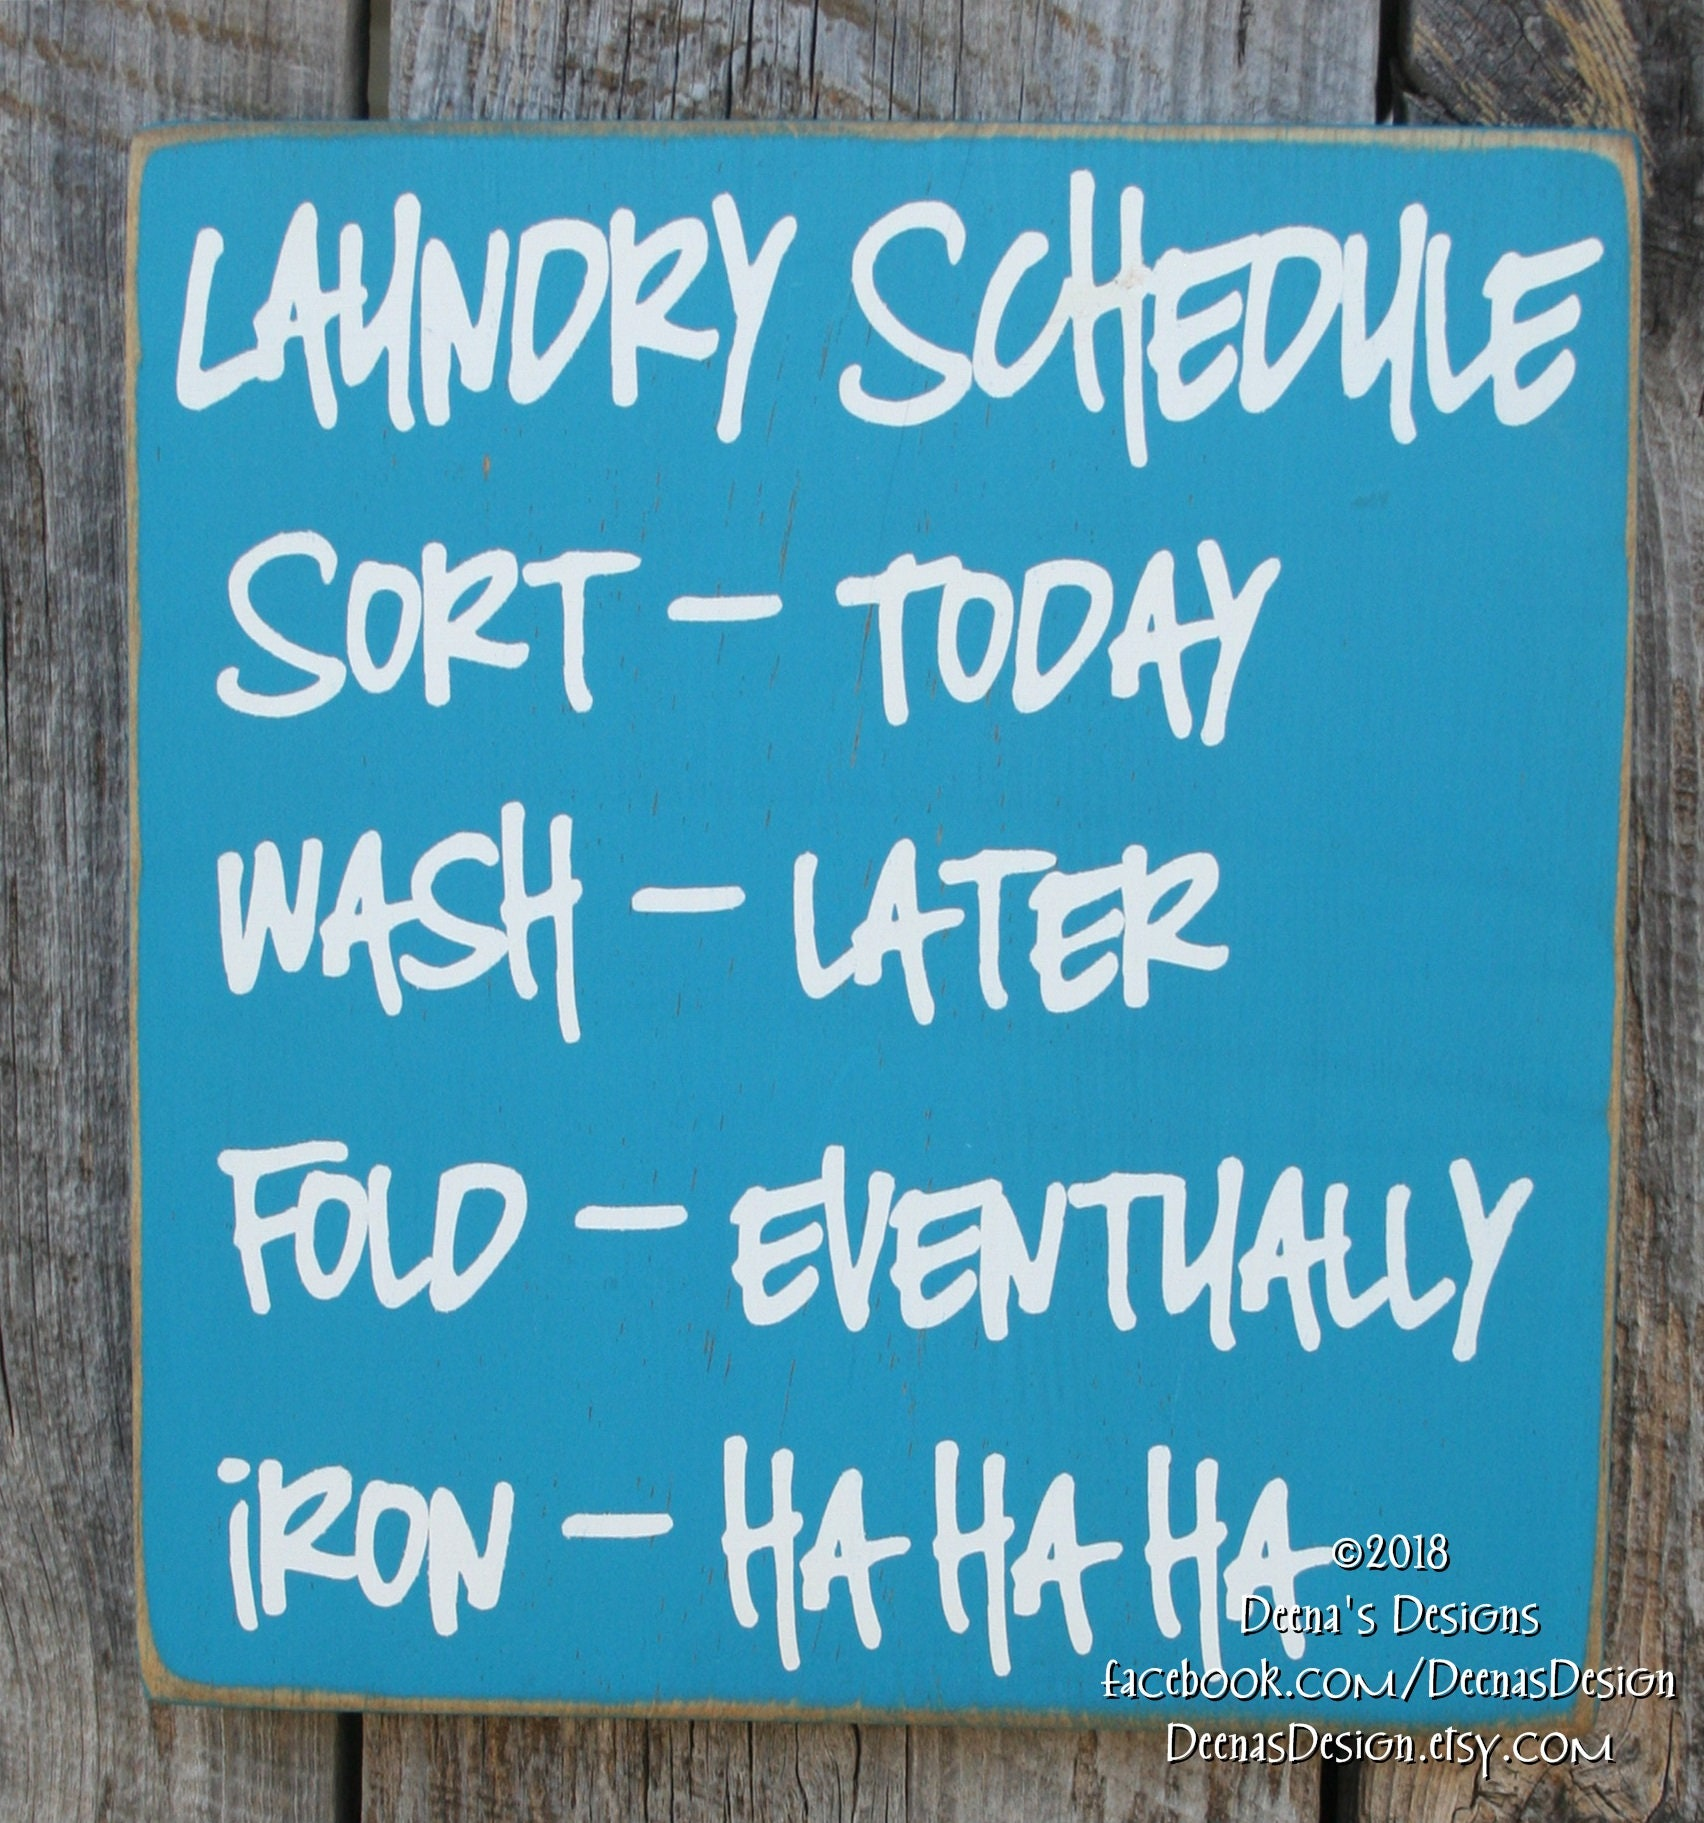 Laundry Schedule, Laundry Room Decor, Laundry Room Sign, Custom Wood Sign, Laundry Room, Laundry Room Schedule, Laundry Humor - Iron HaHaHa